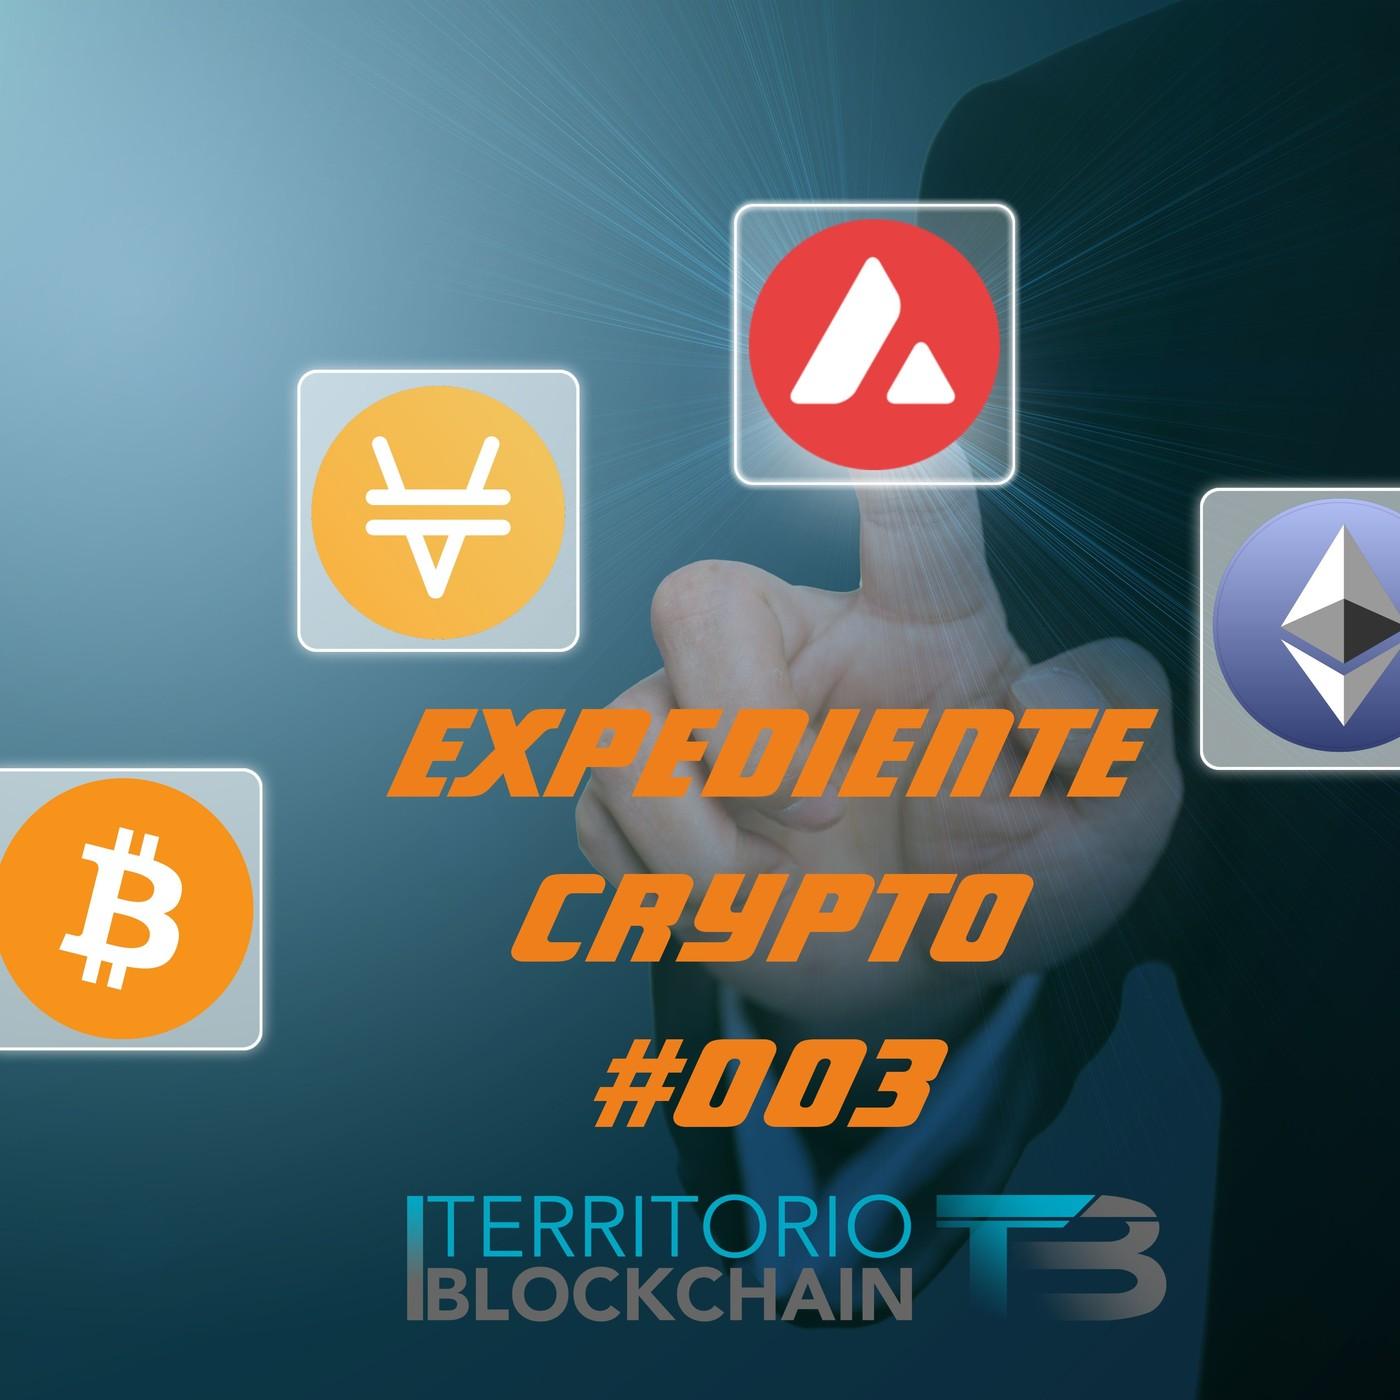 Expediente Crypto #003